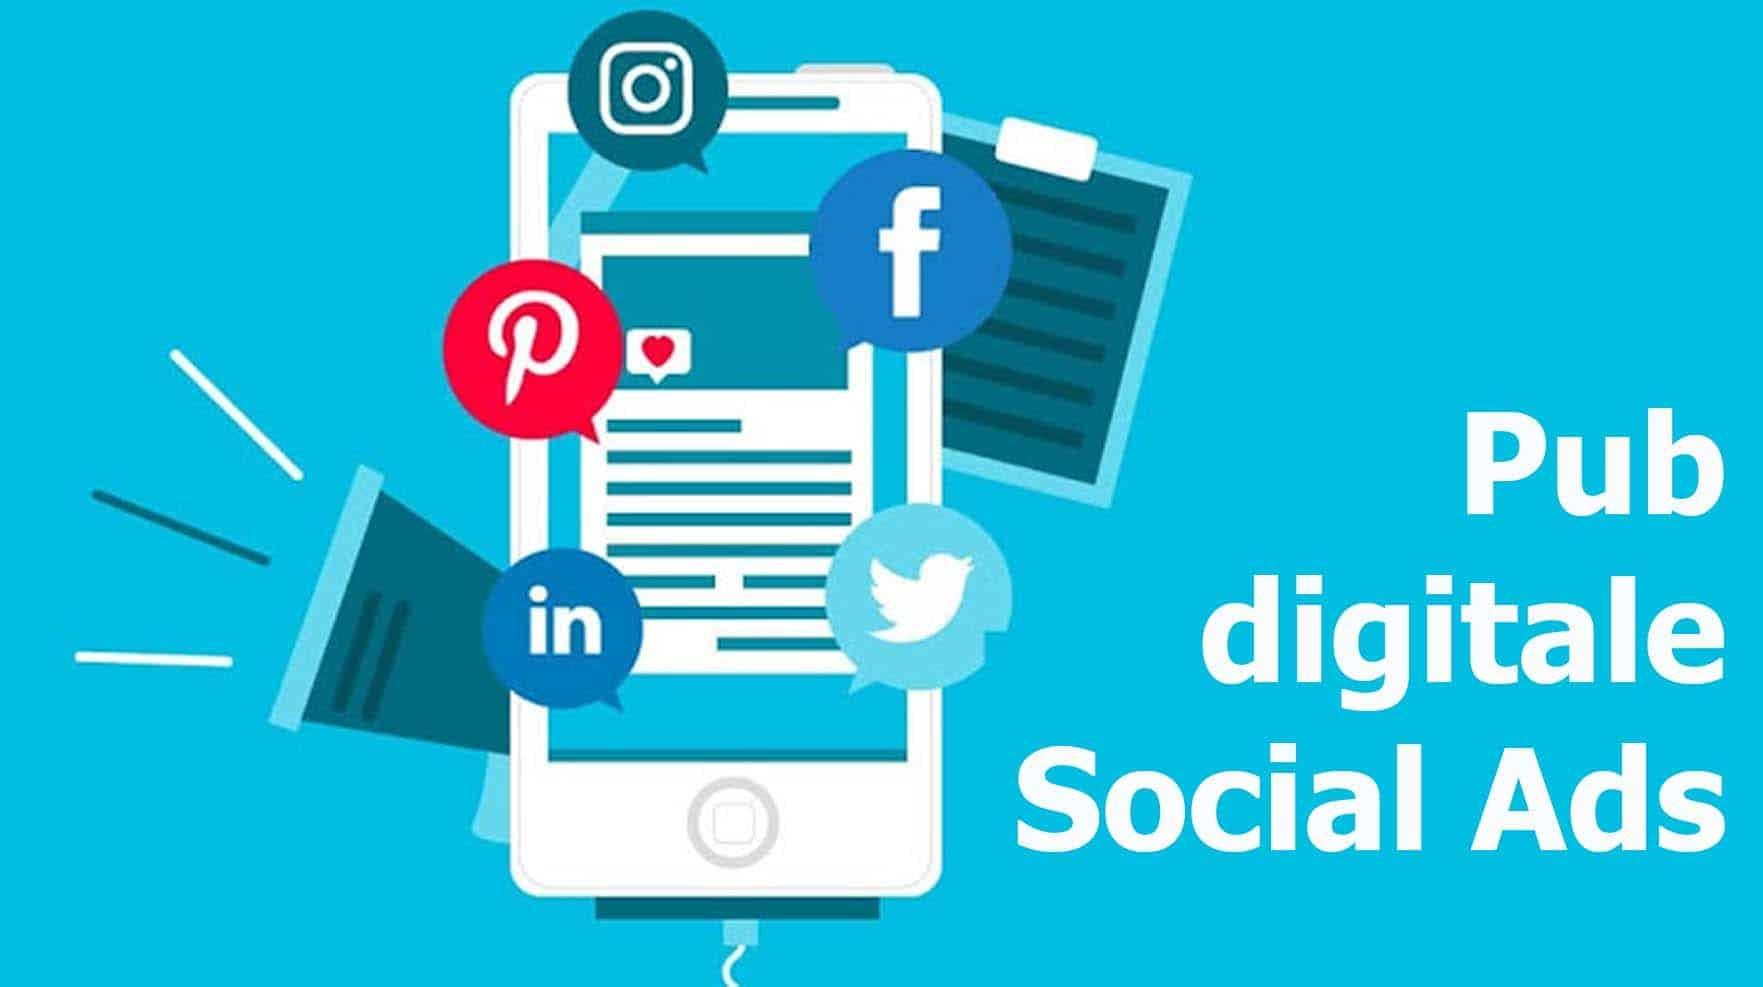 Prestation-Social-Ads-Pub-Digitale-Agence-Marketing-dgital